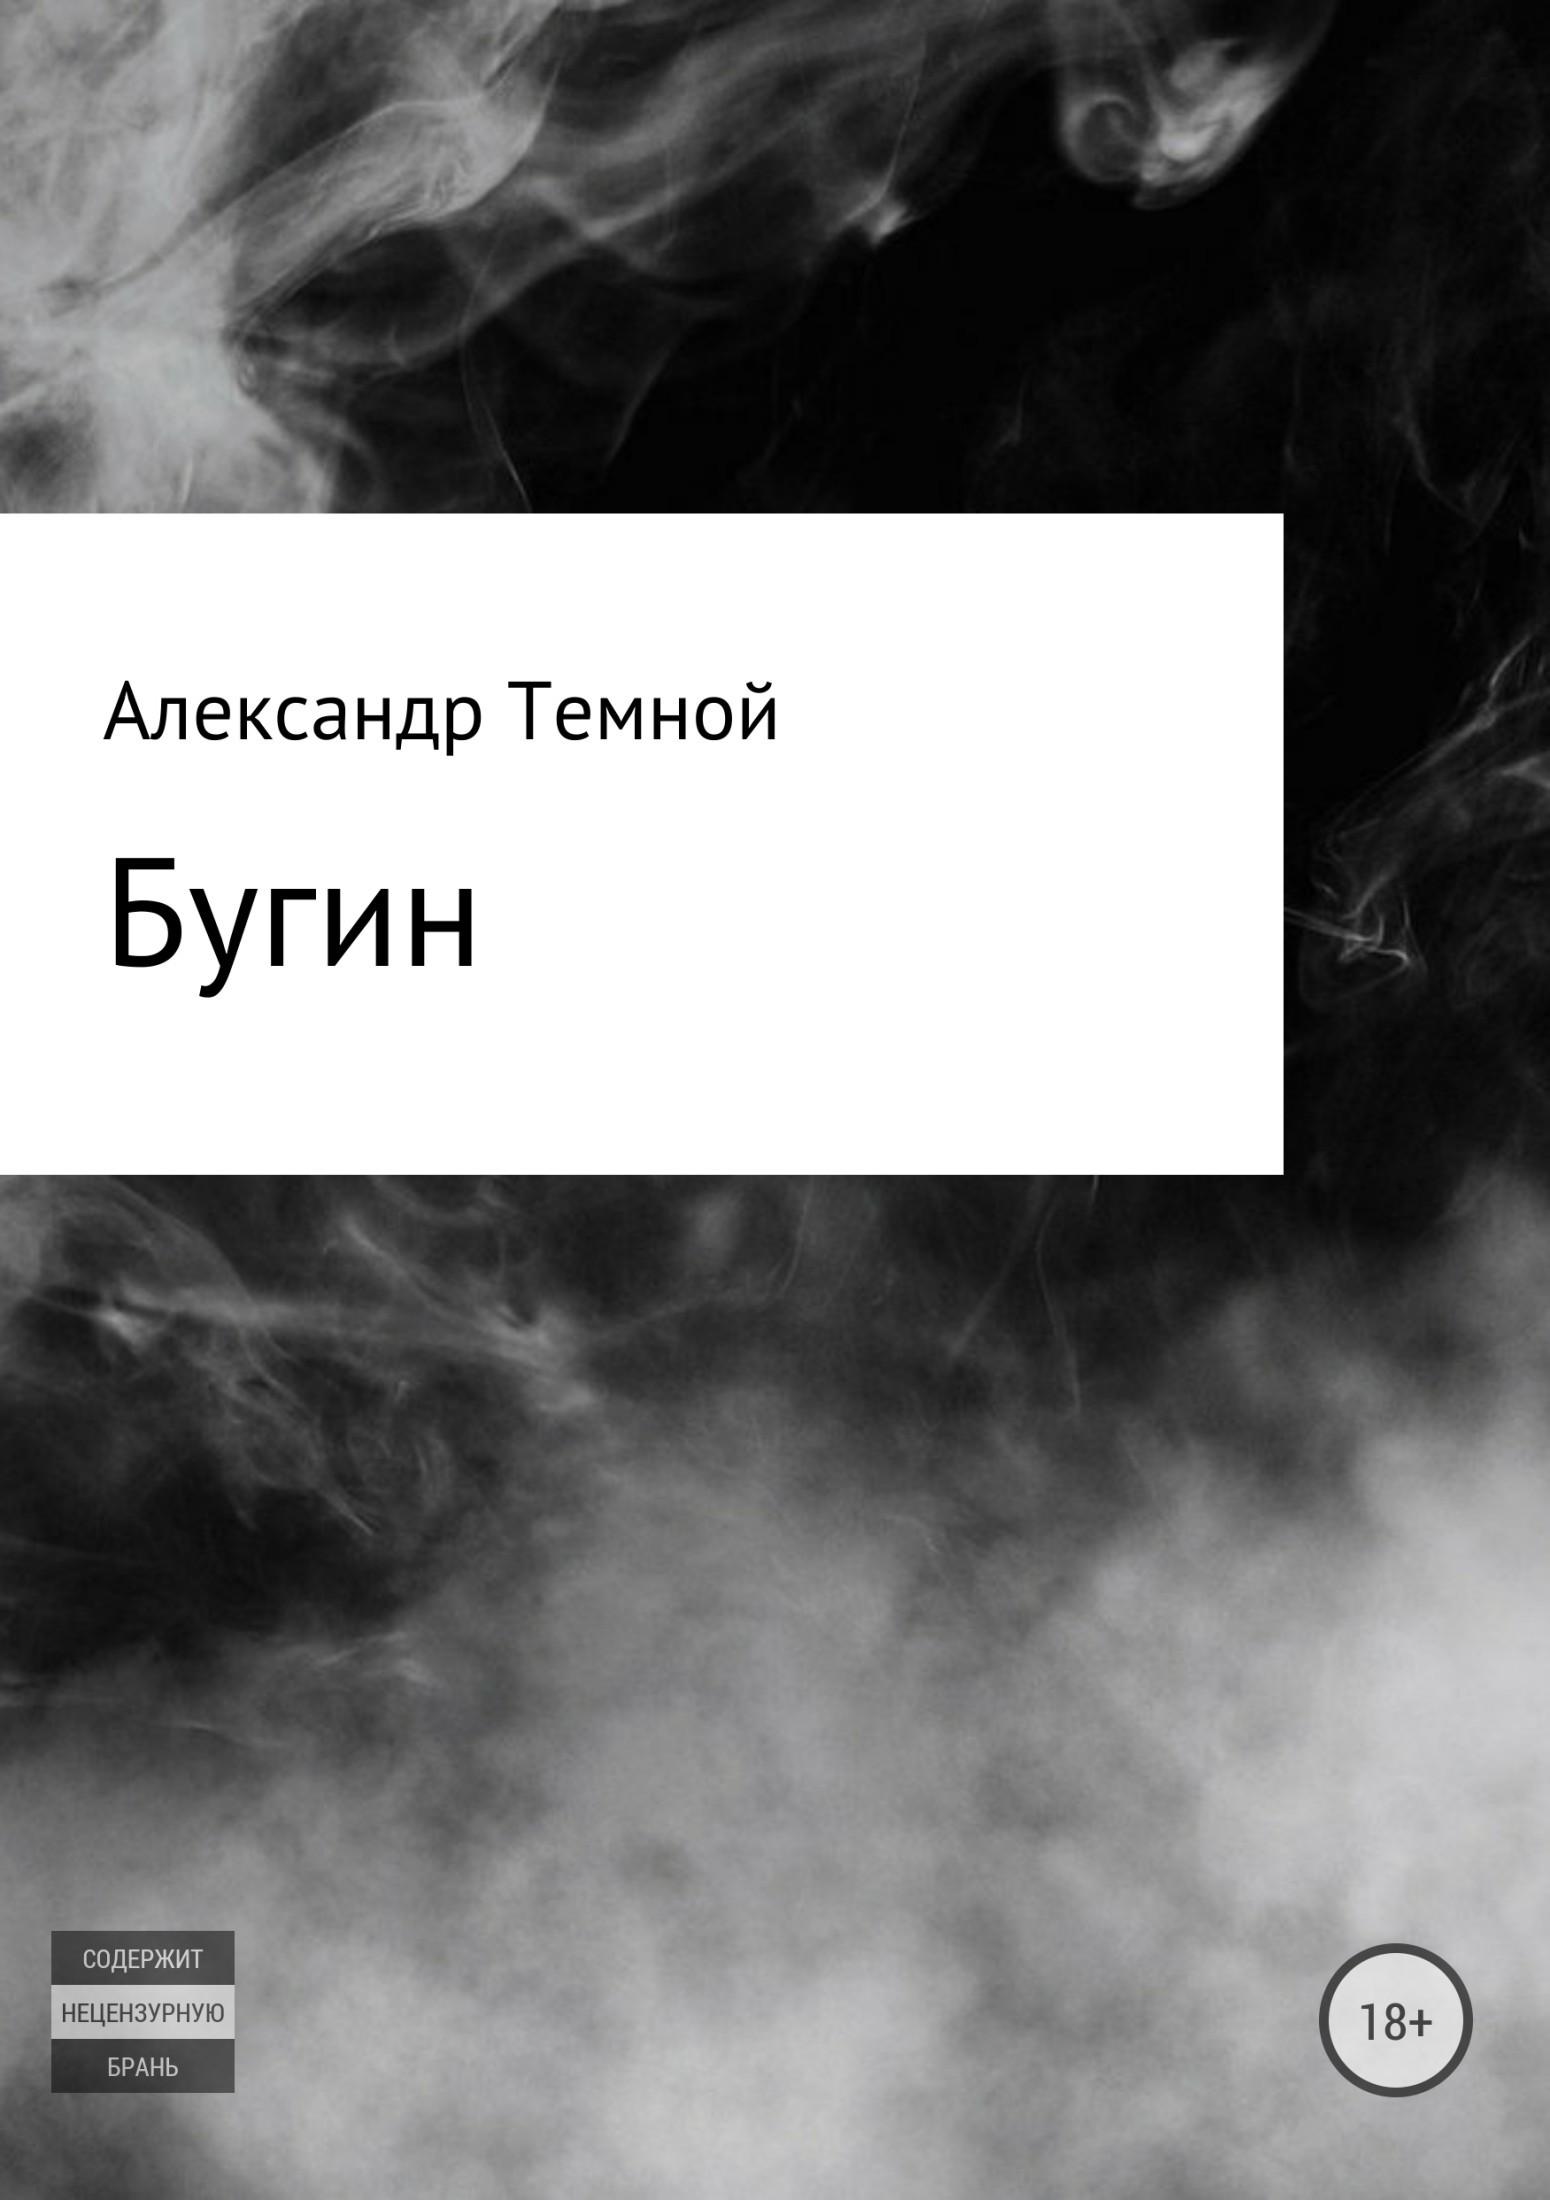 все цены на Александр Валерьевич Темной Бугин онлайн